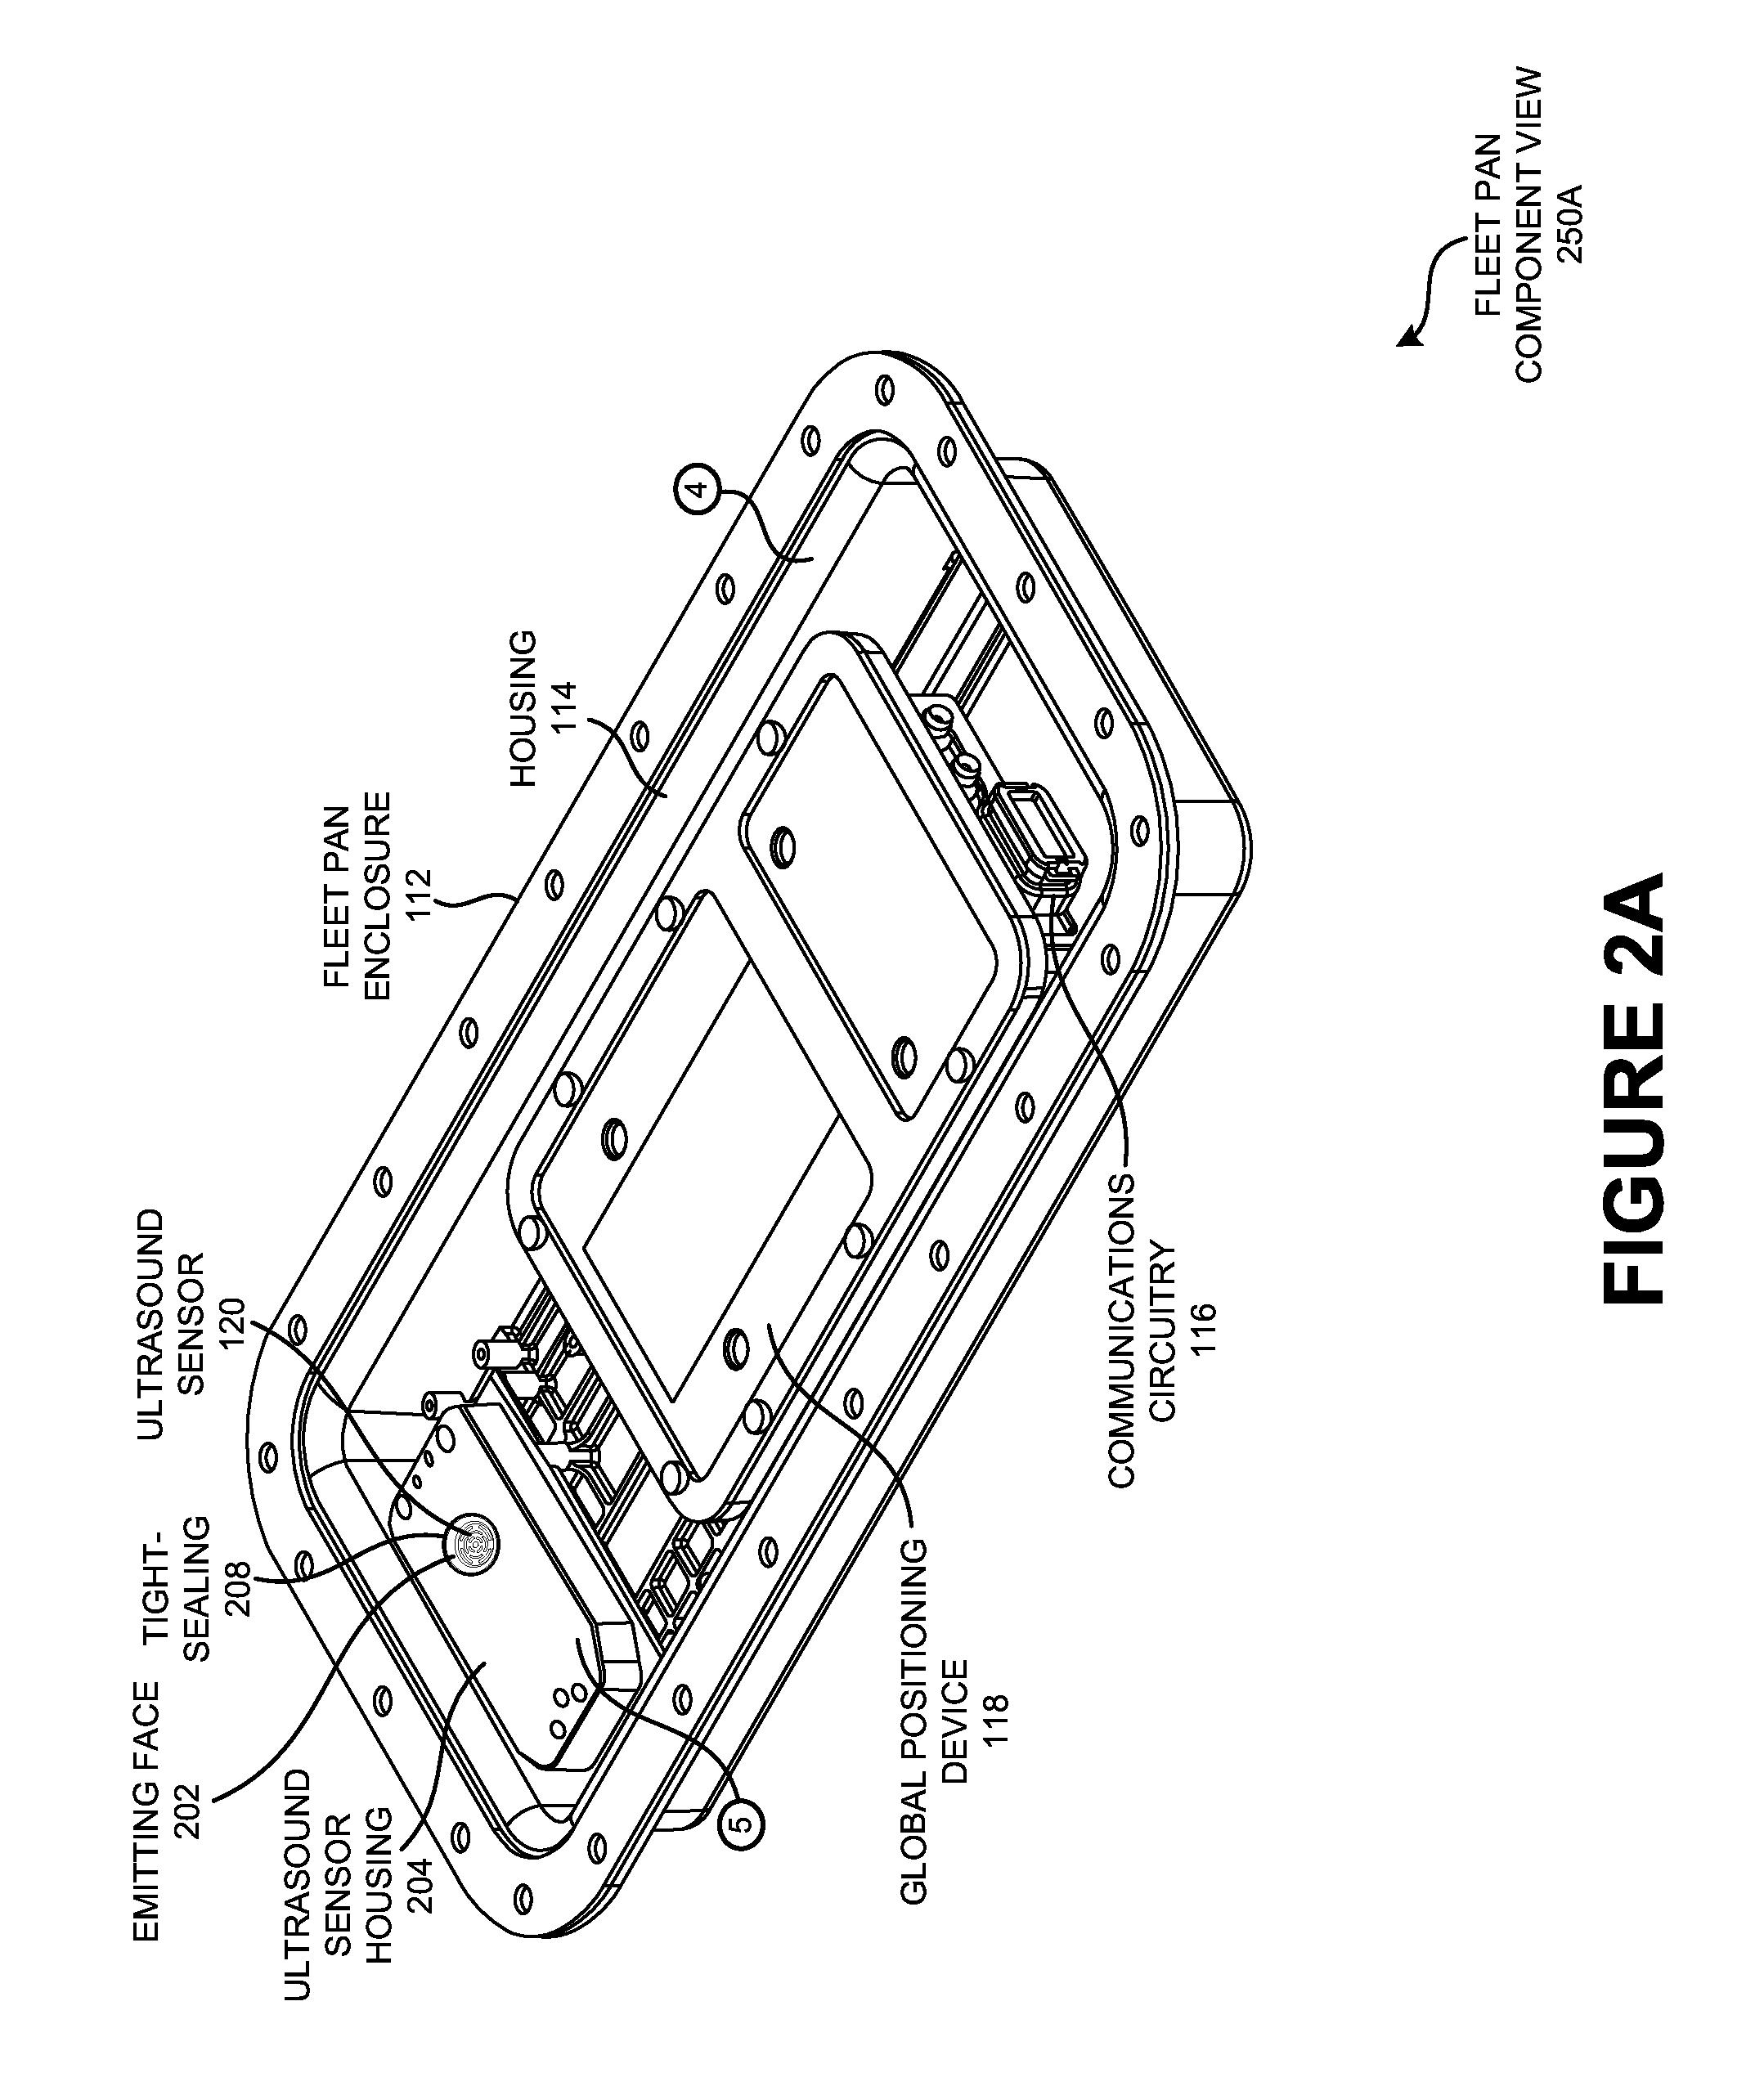 Patent US 9,551,788 B2